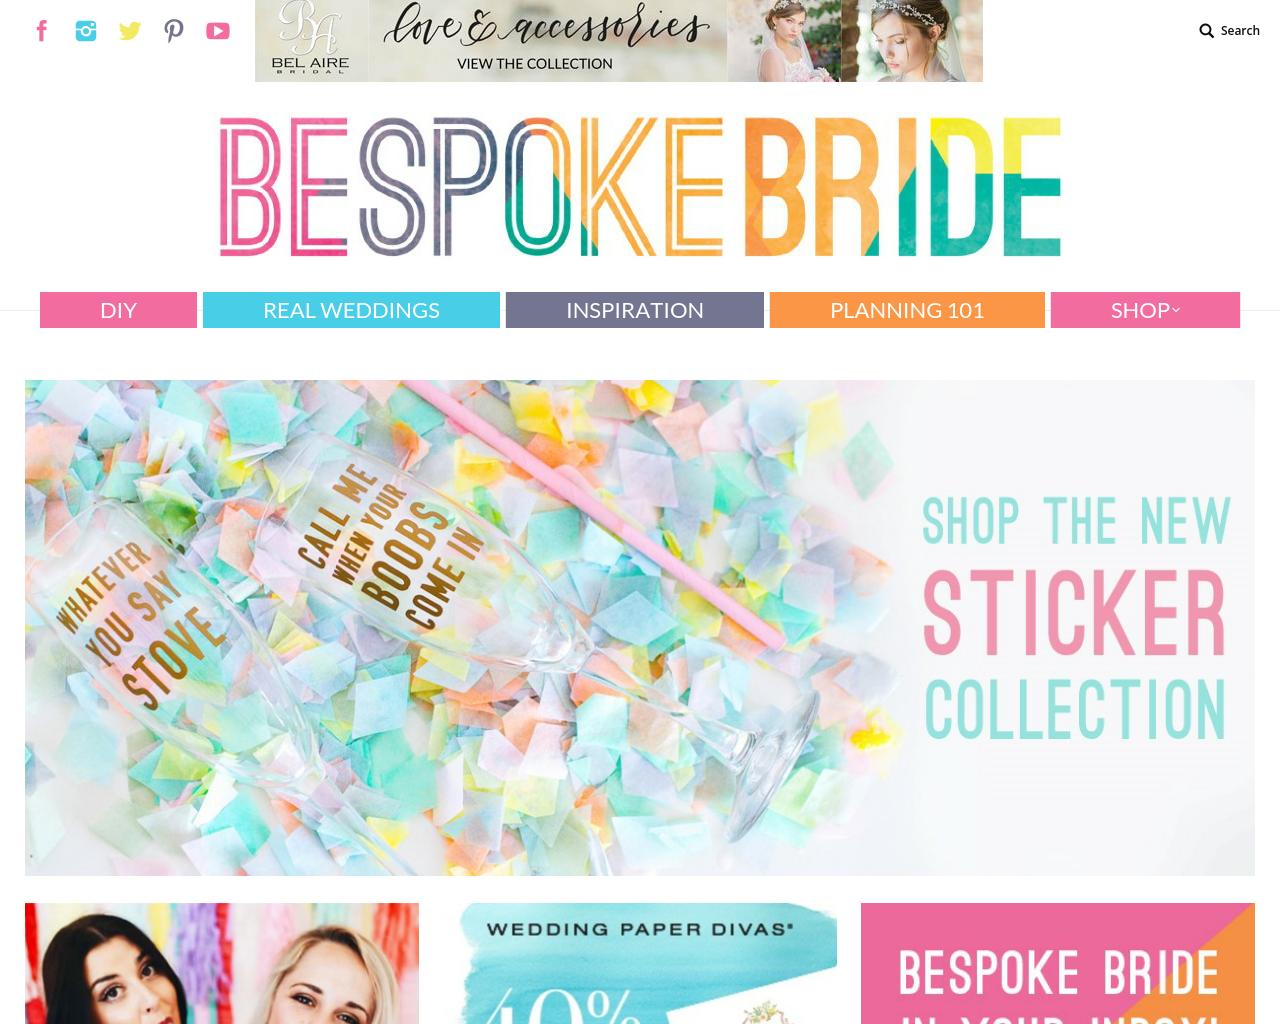 Bespoke-Bride-Advertising-Reviews-Pricing